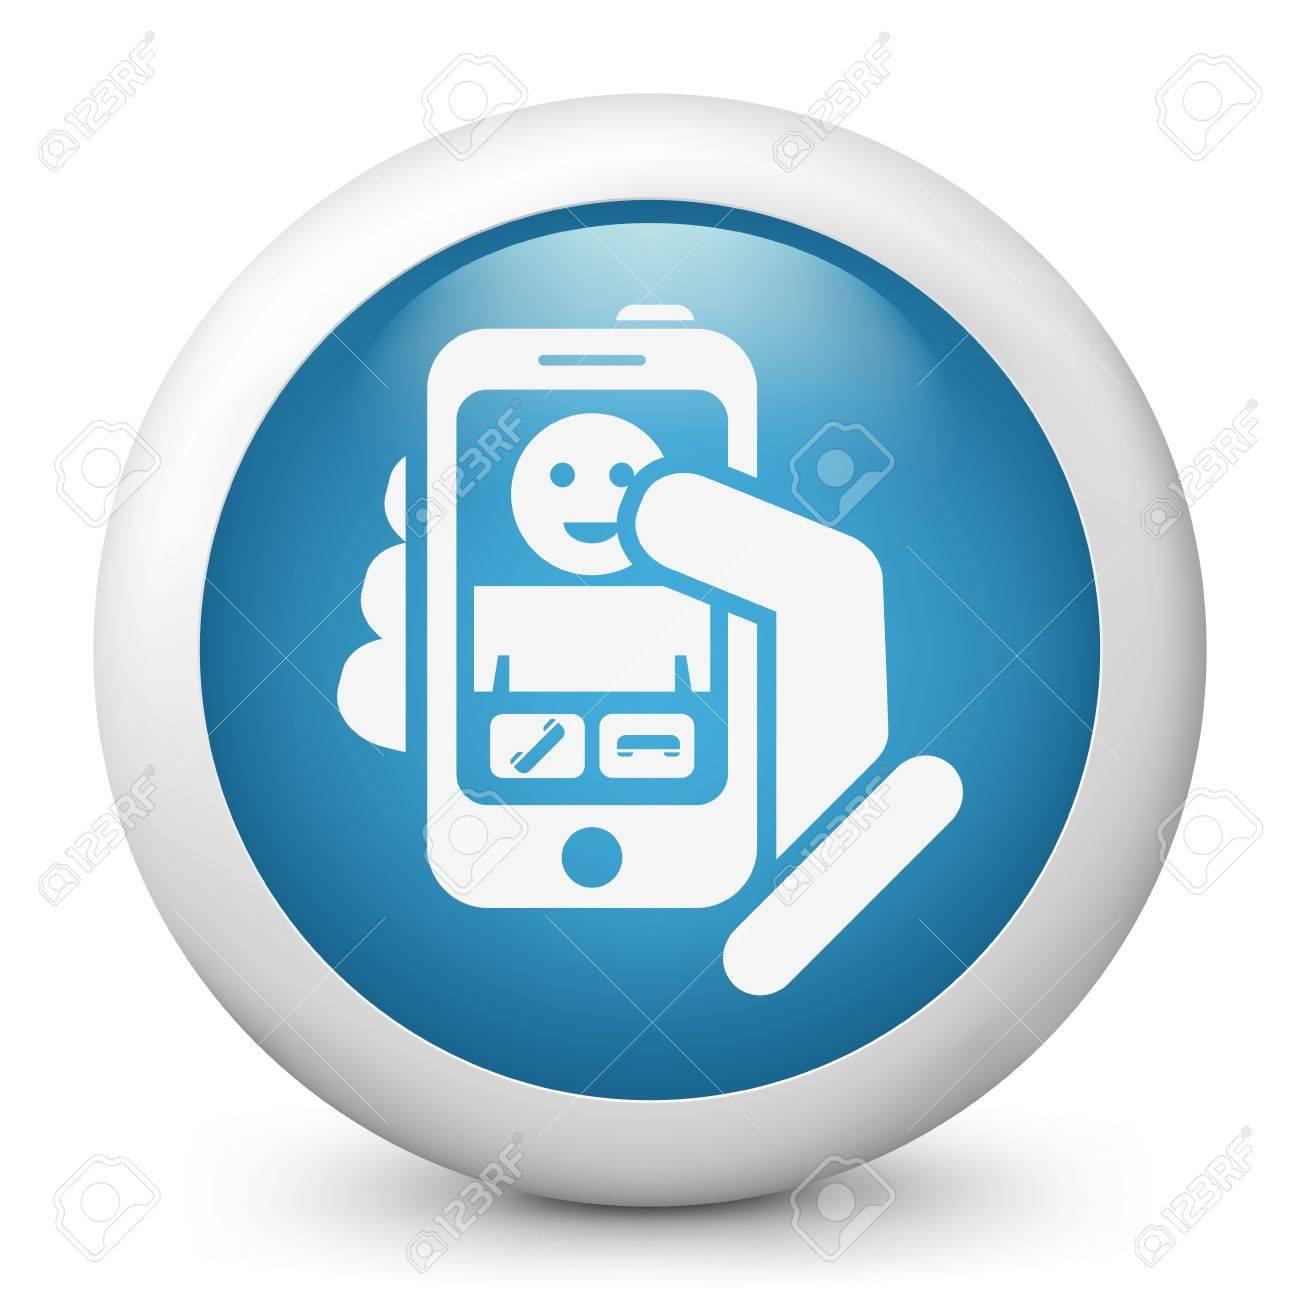 Smartphon incoming call icon Stock Vector - 19876643